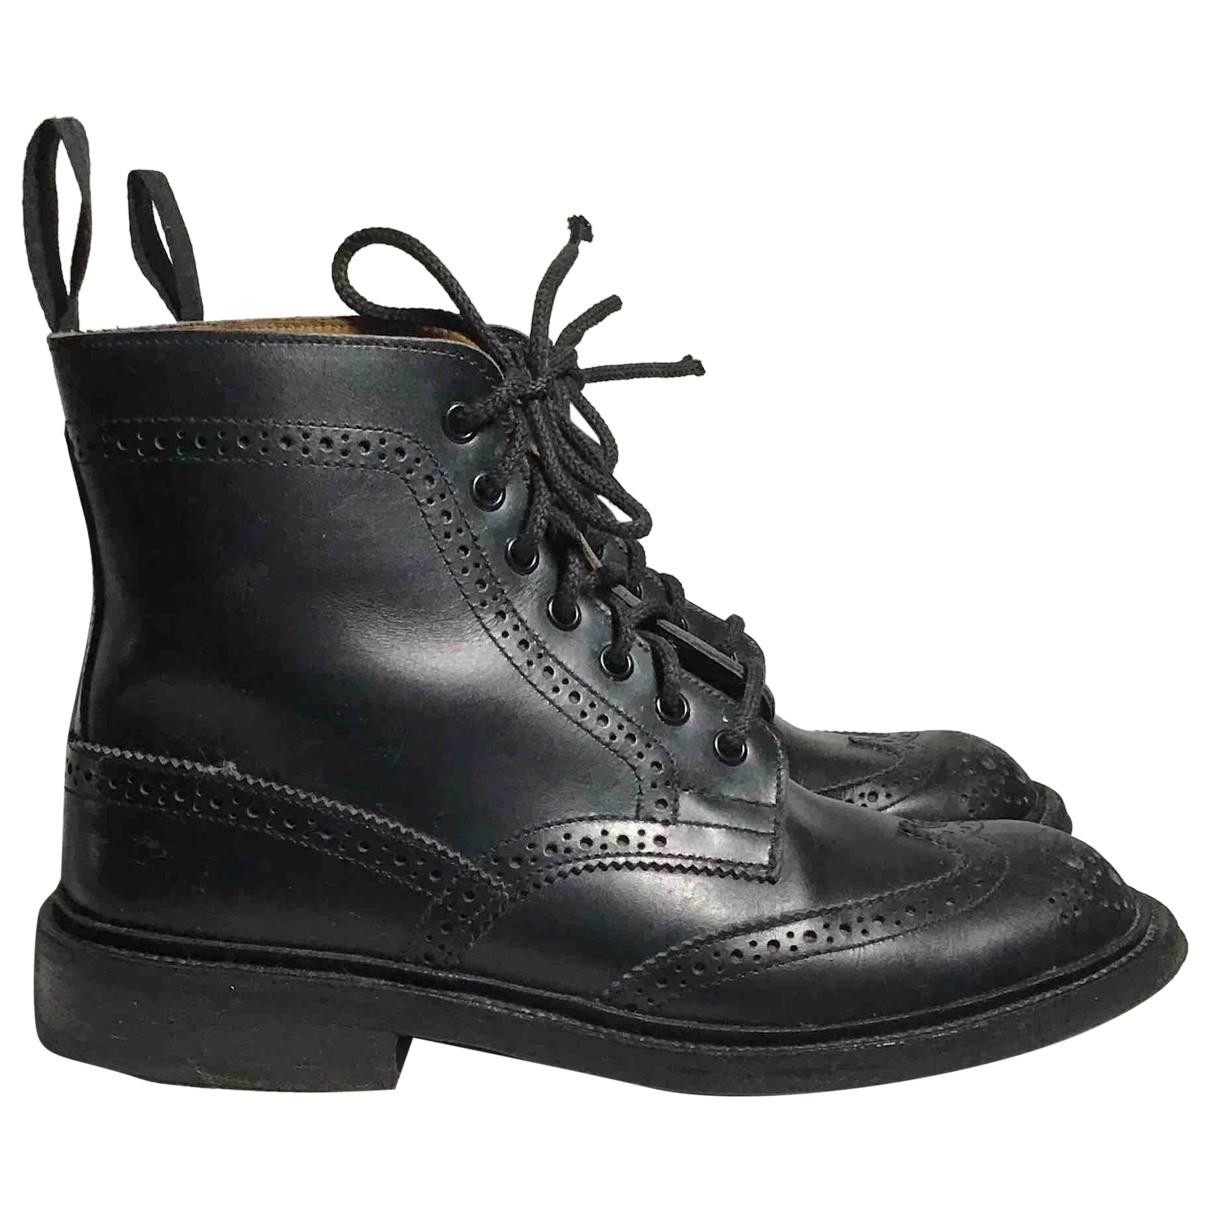 Trickers London \N Stiefel in  Schwarz Lackleder